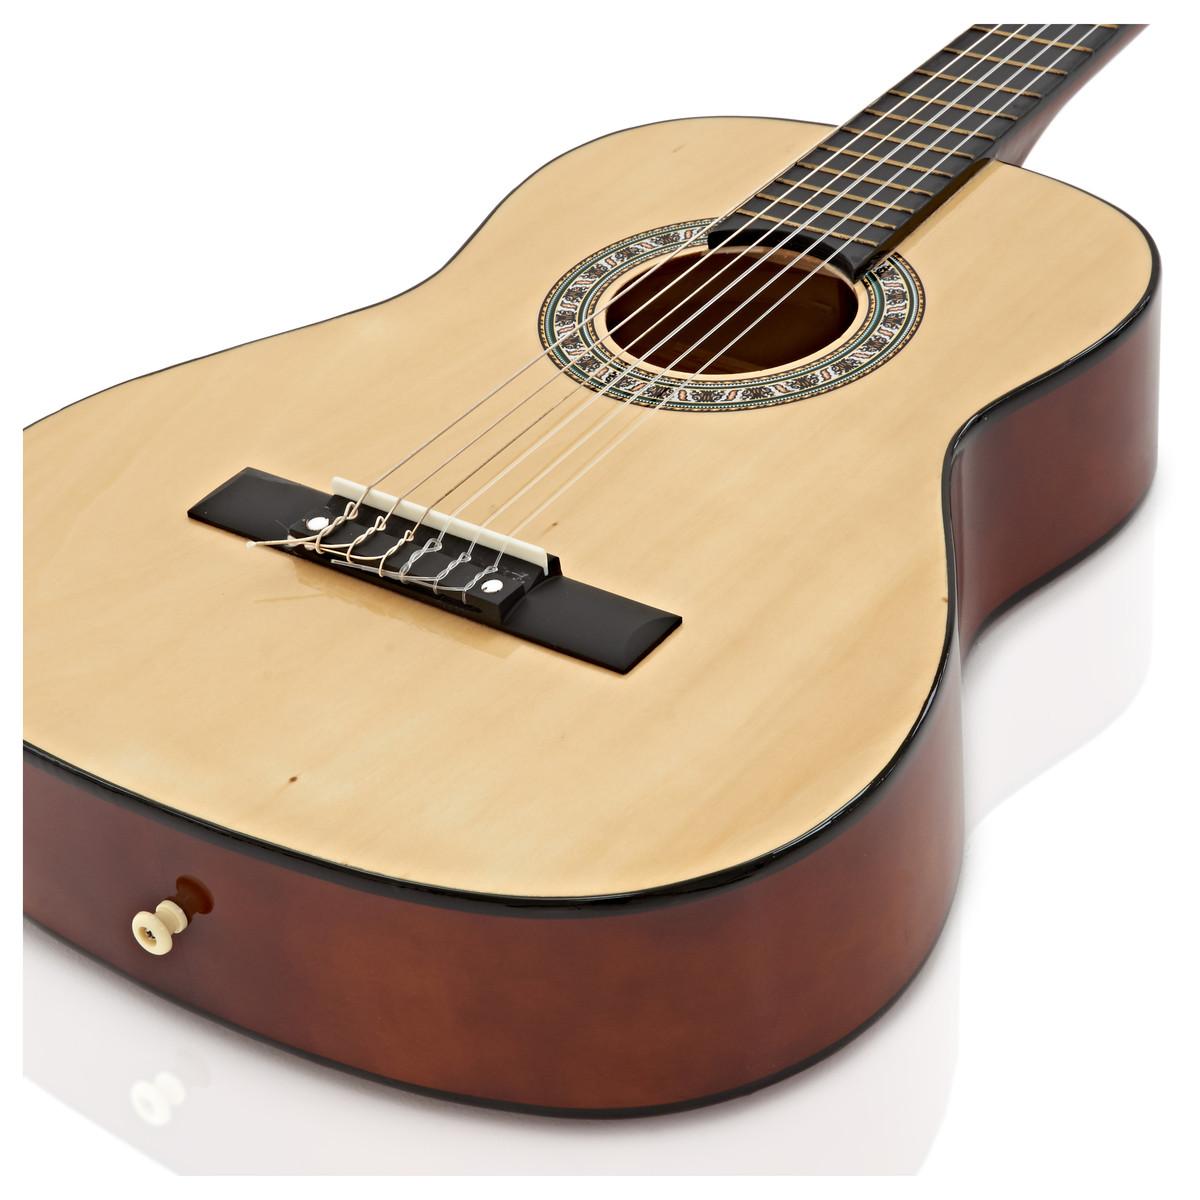 guitare classique 3 4 natural de gear4music b stock. Black Bedroom Furniture Sets. Home Design Ideas